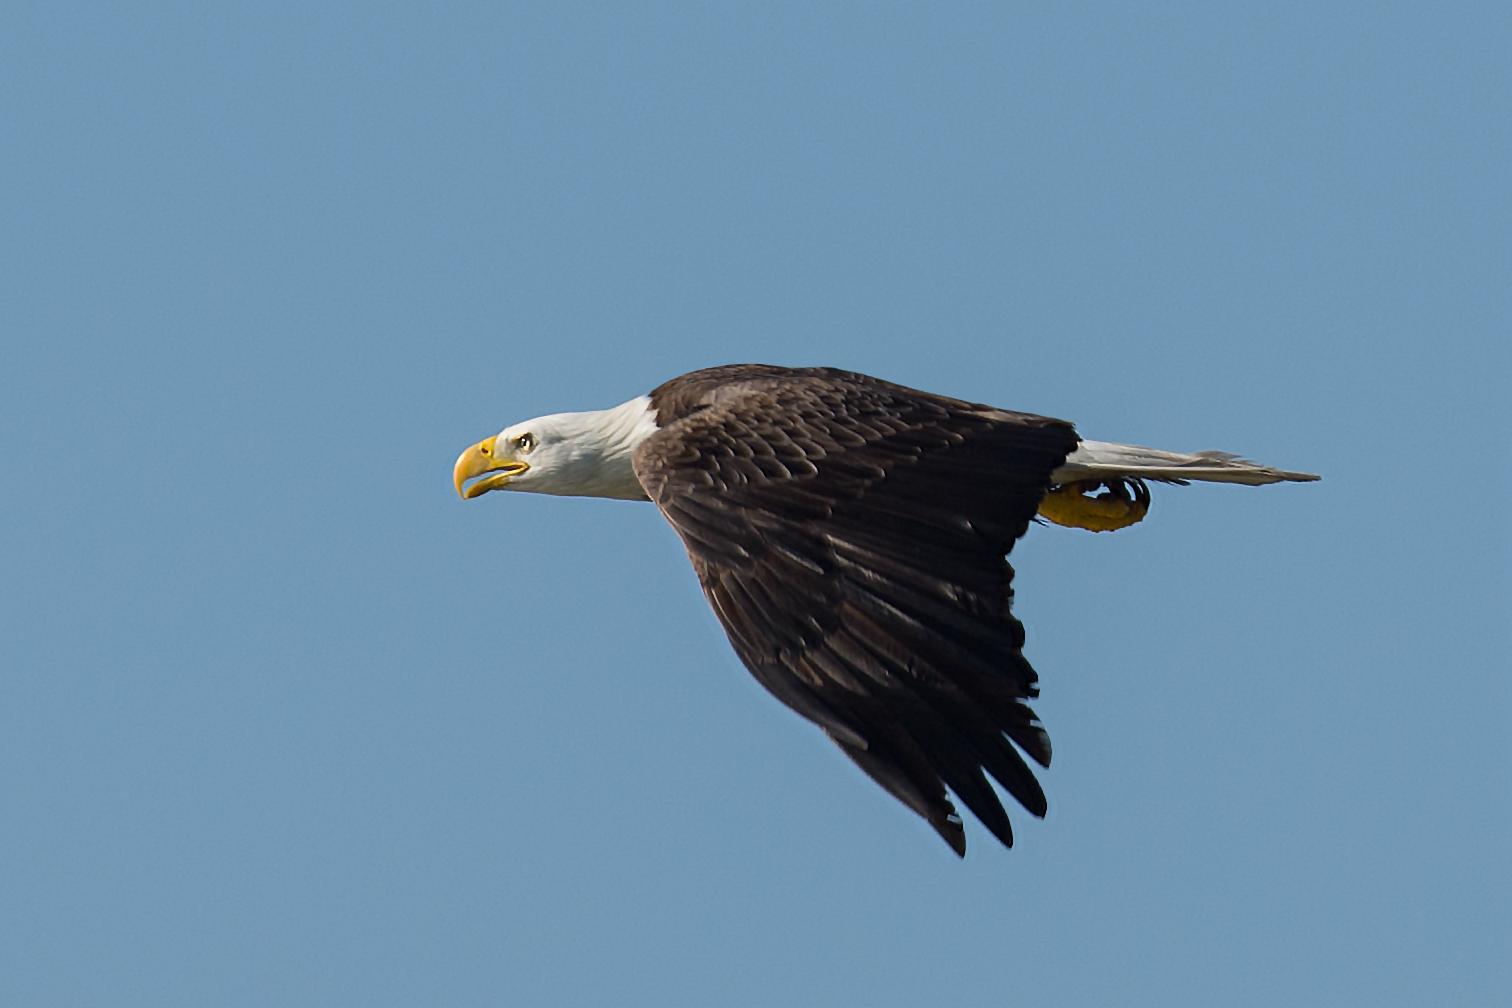 File:Bald eagle flat out (22979176781).jpg - Wikimedia Commons